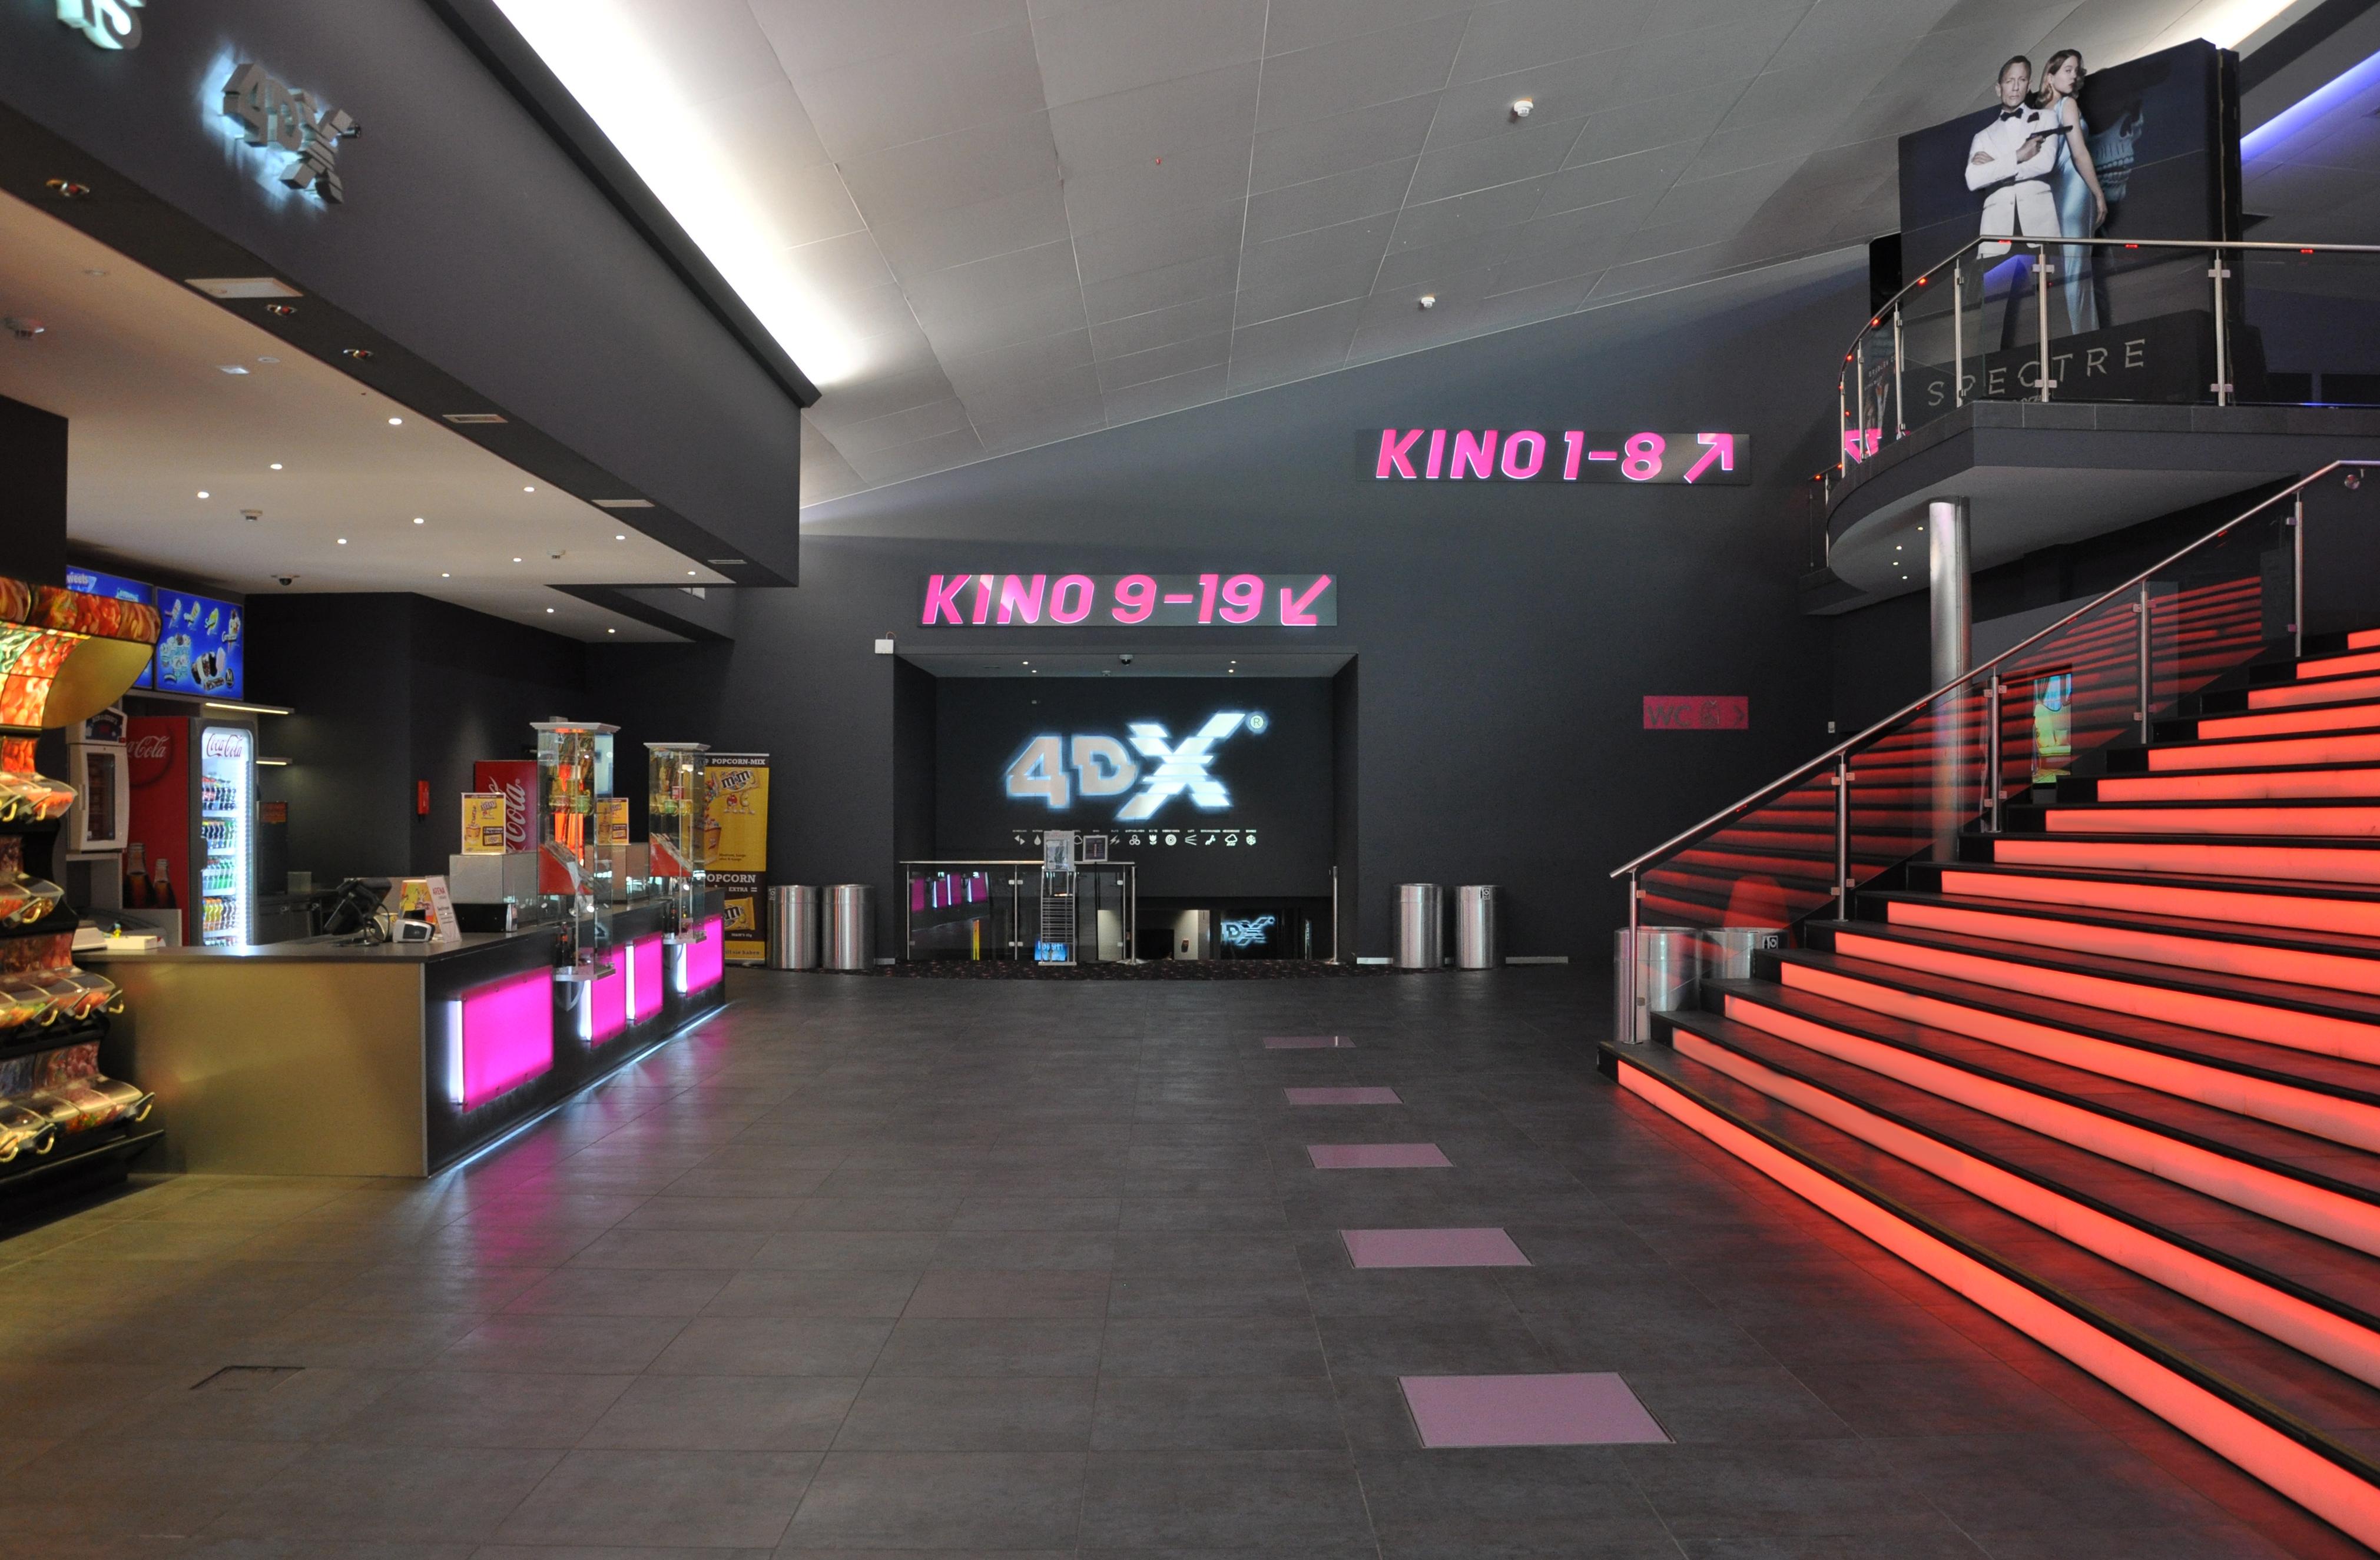 Kino Schweiz